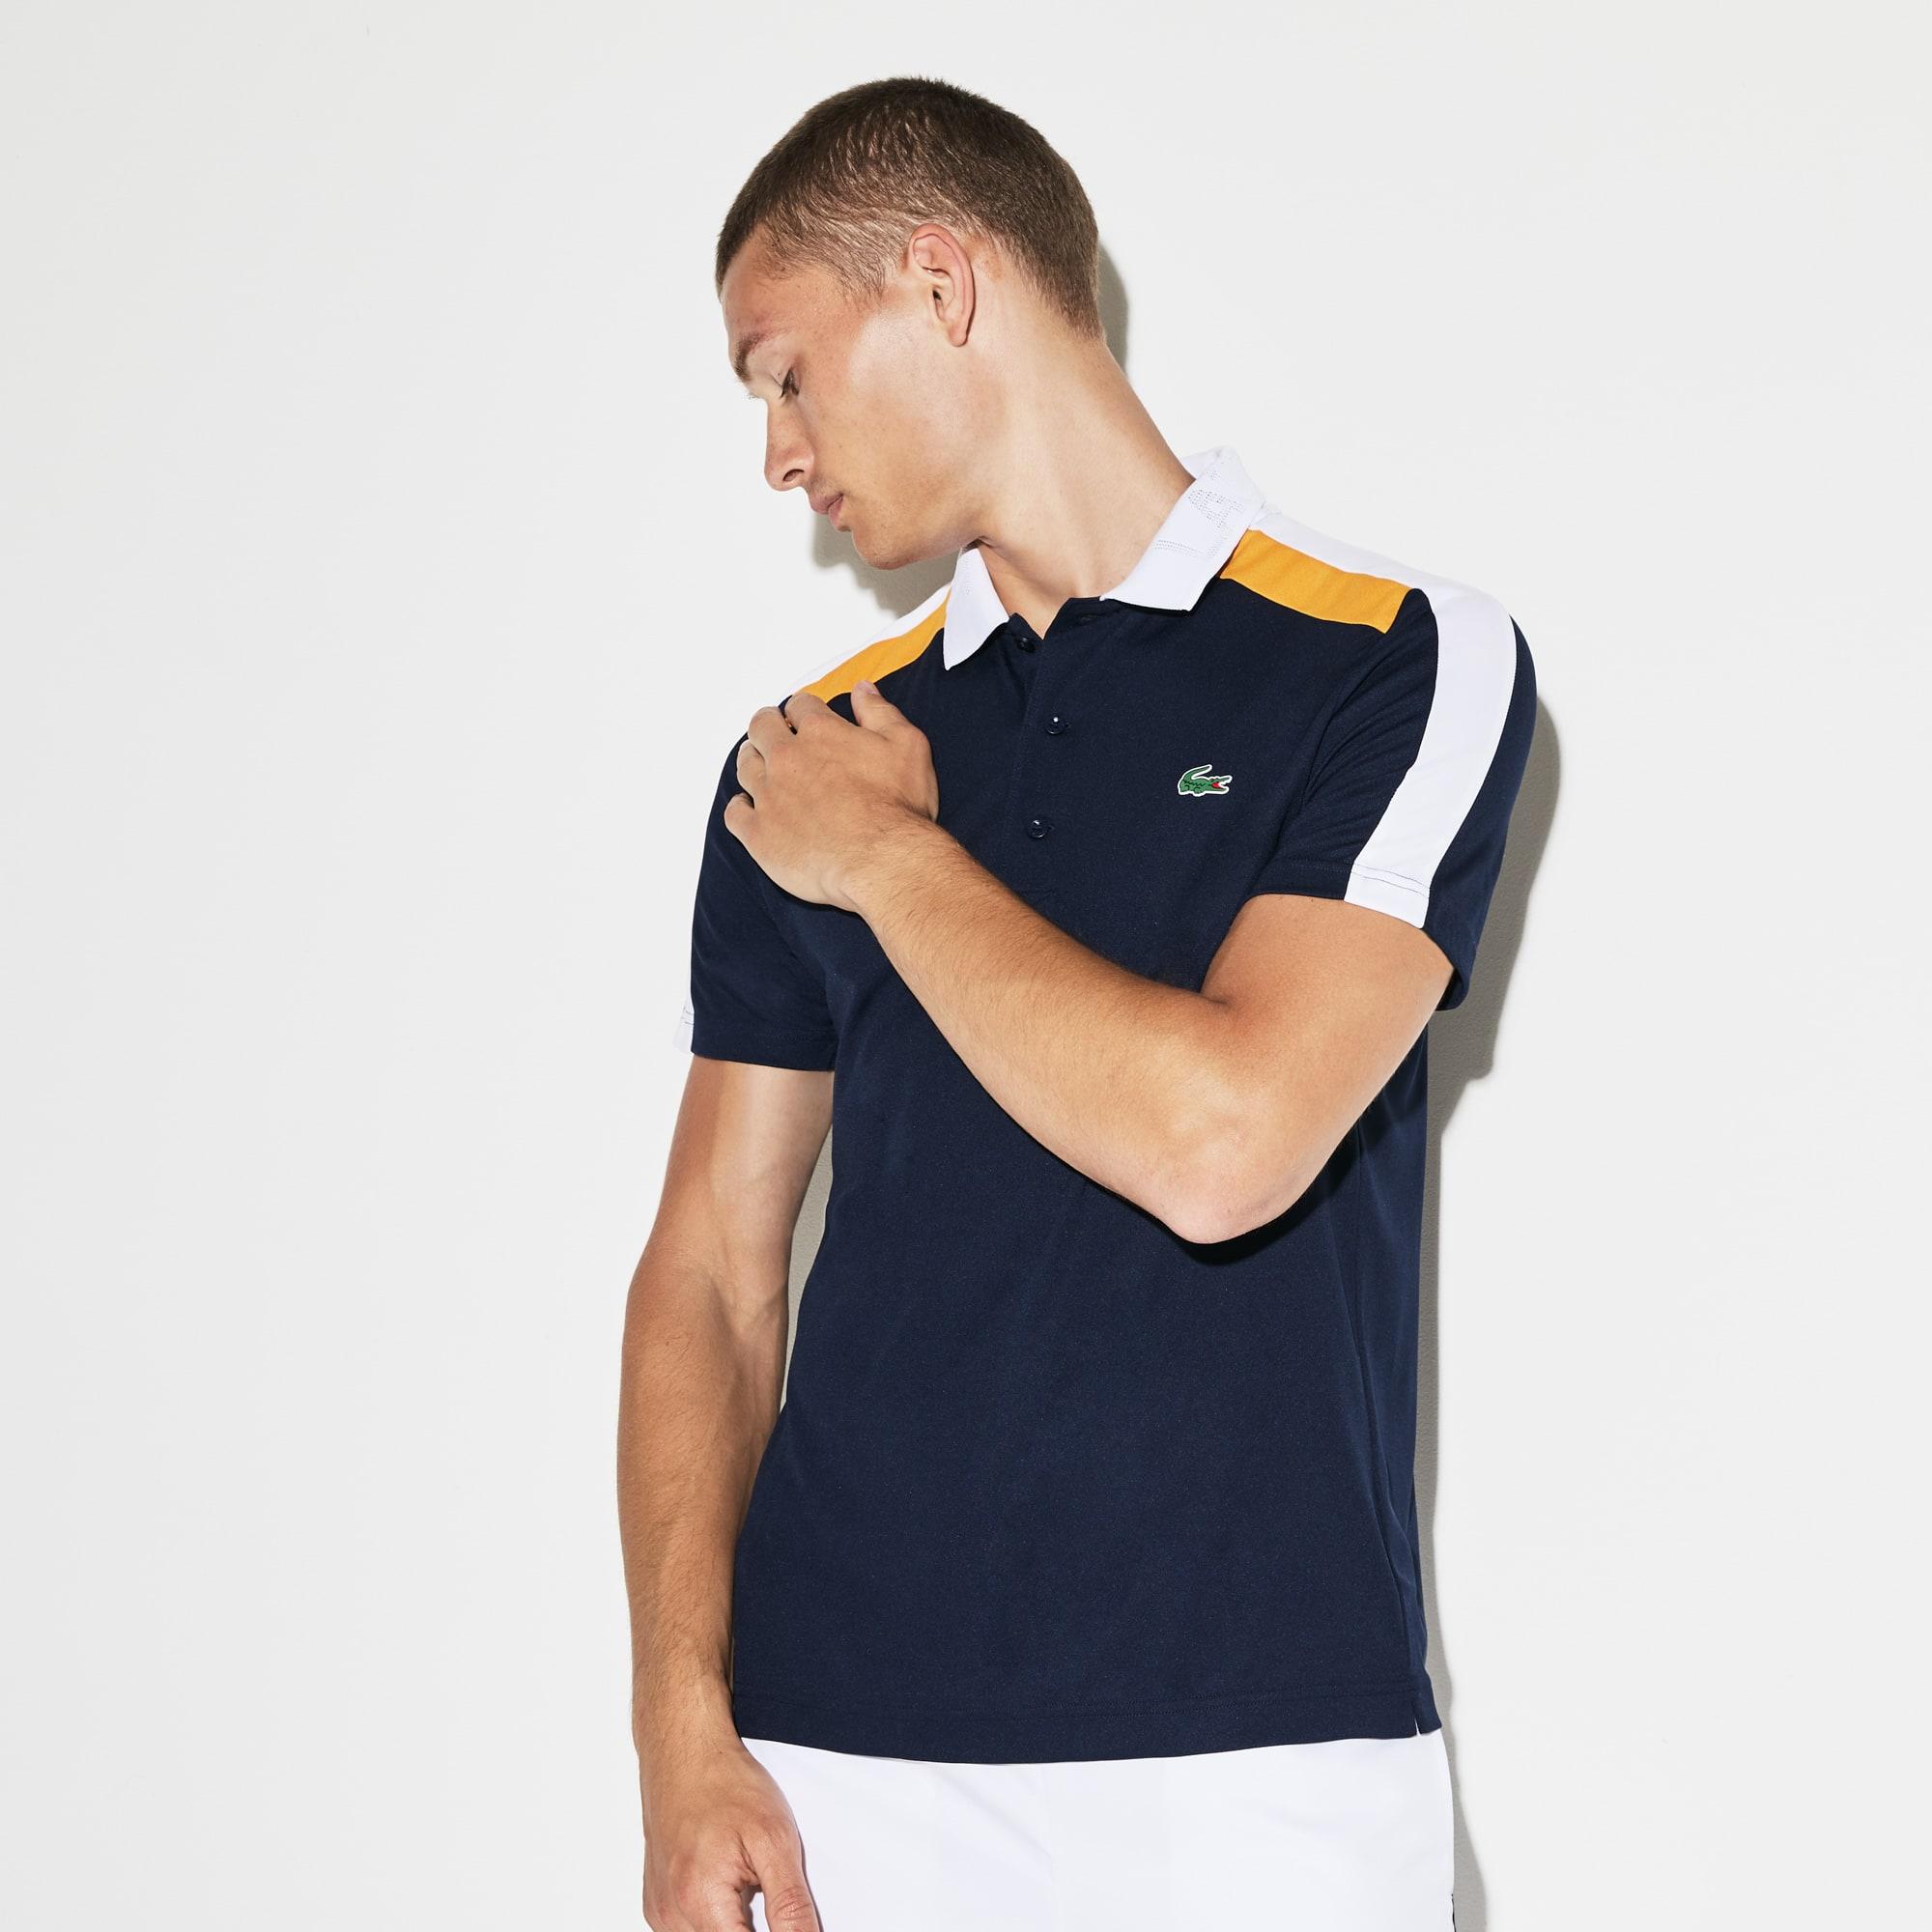 f0bde7c866 Men's Lacoste SPORT Contrast Band Technical Piqué Tennis Polo Shirt